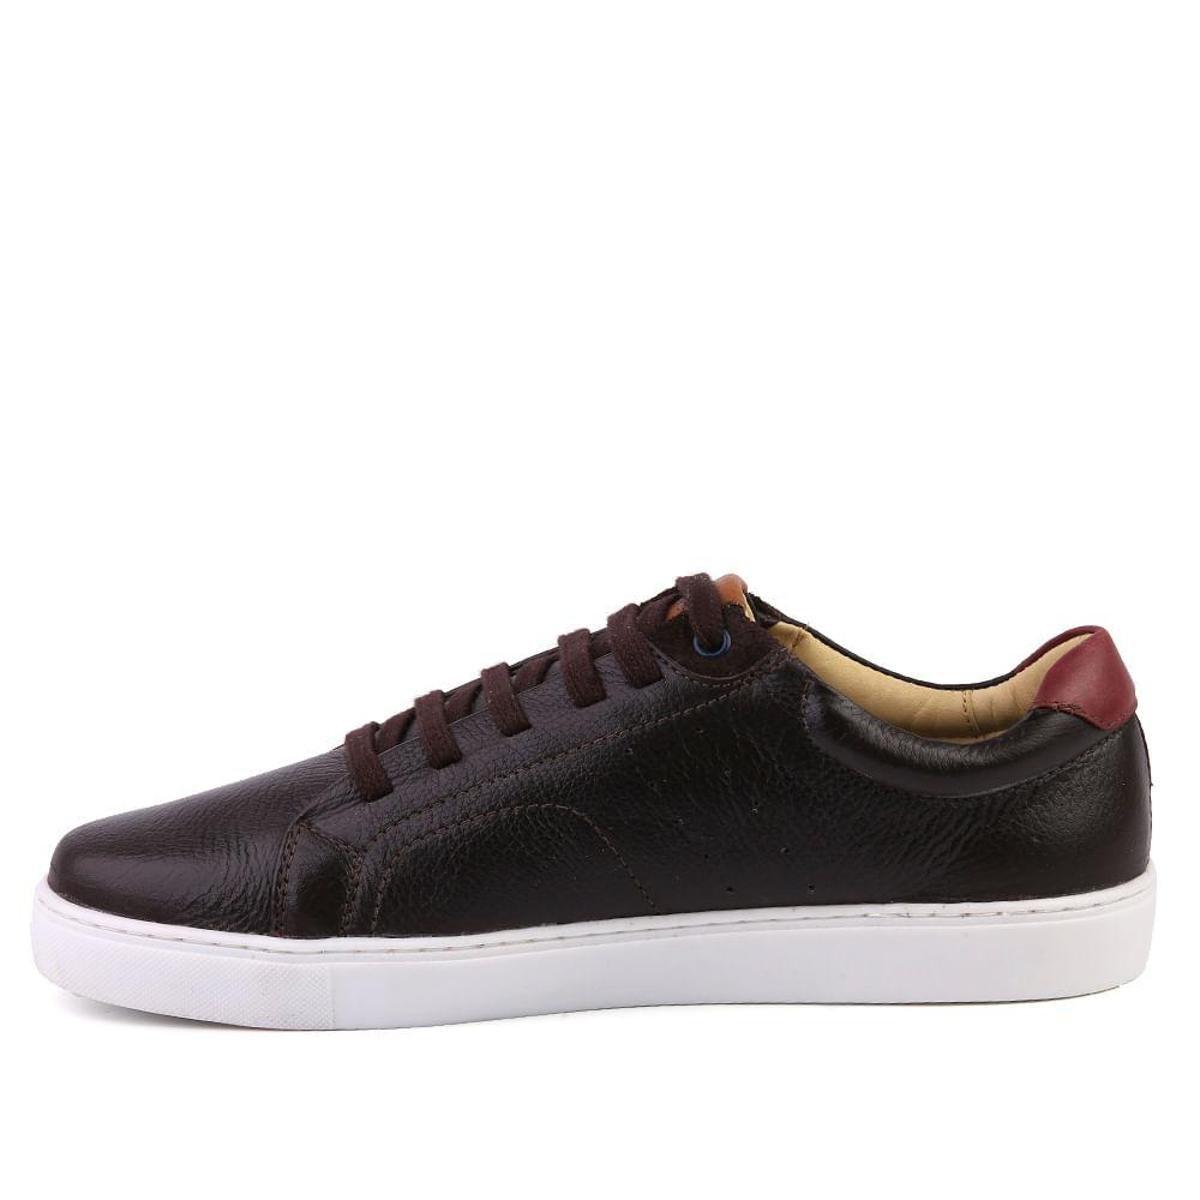 Couro Floater Masculino Shoes Sapatênis Sapatênis Marrom 4041 Couro Doctor Havana HwS6v7nq